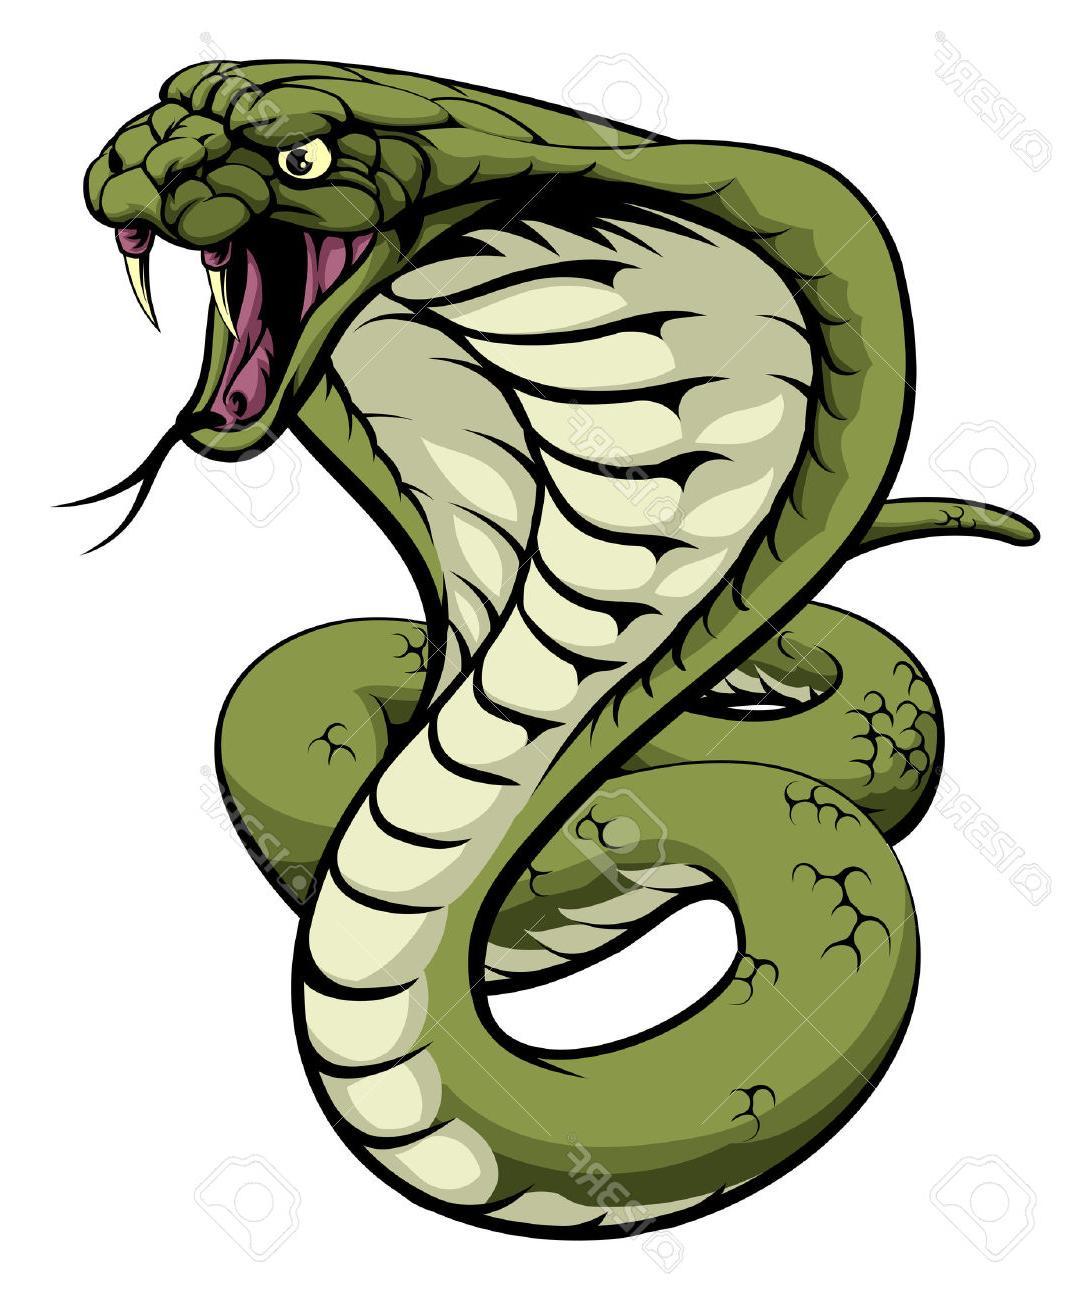 Free download best on. Cobra clipart king cobra